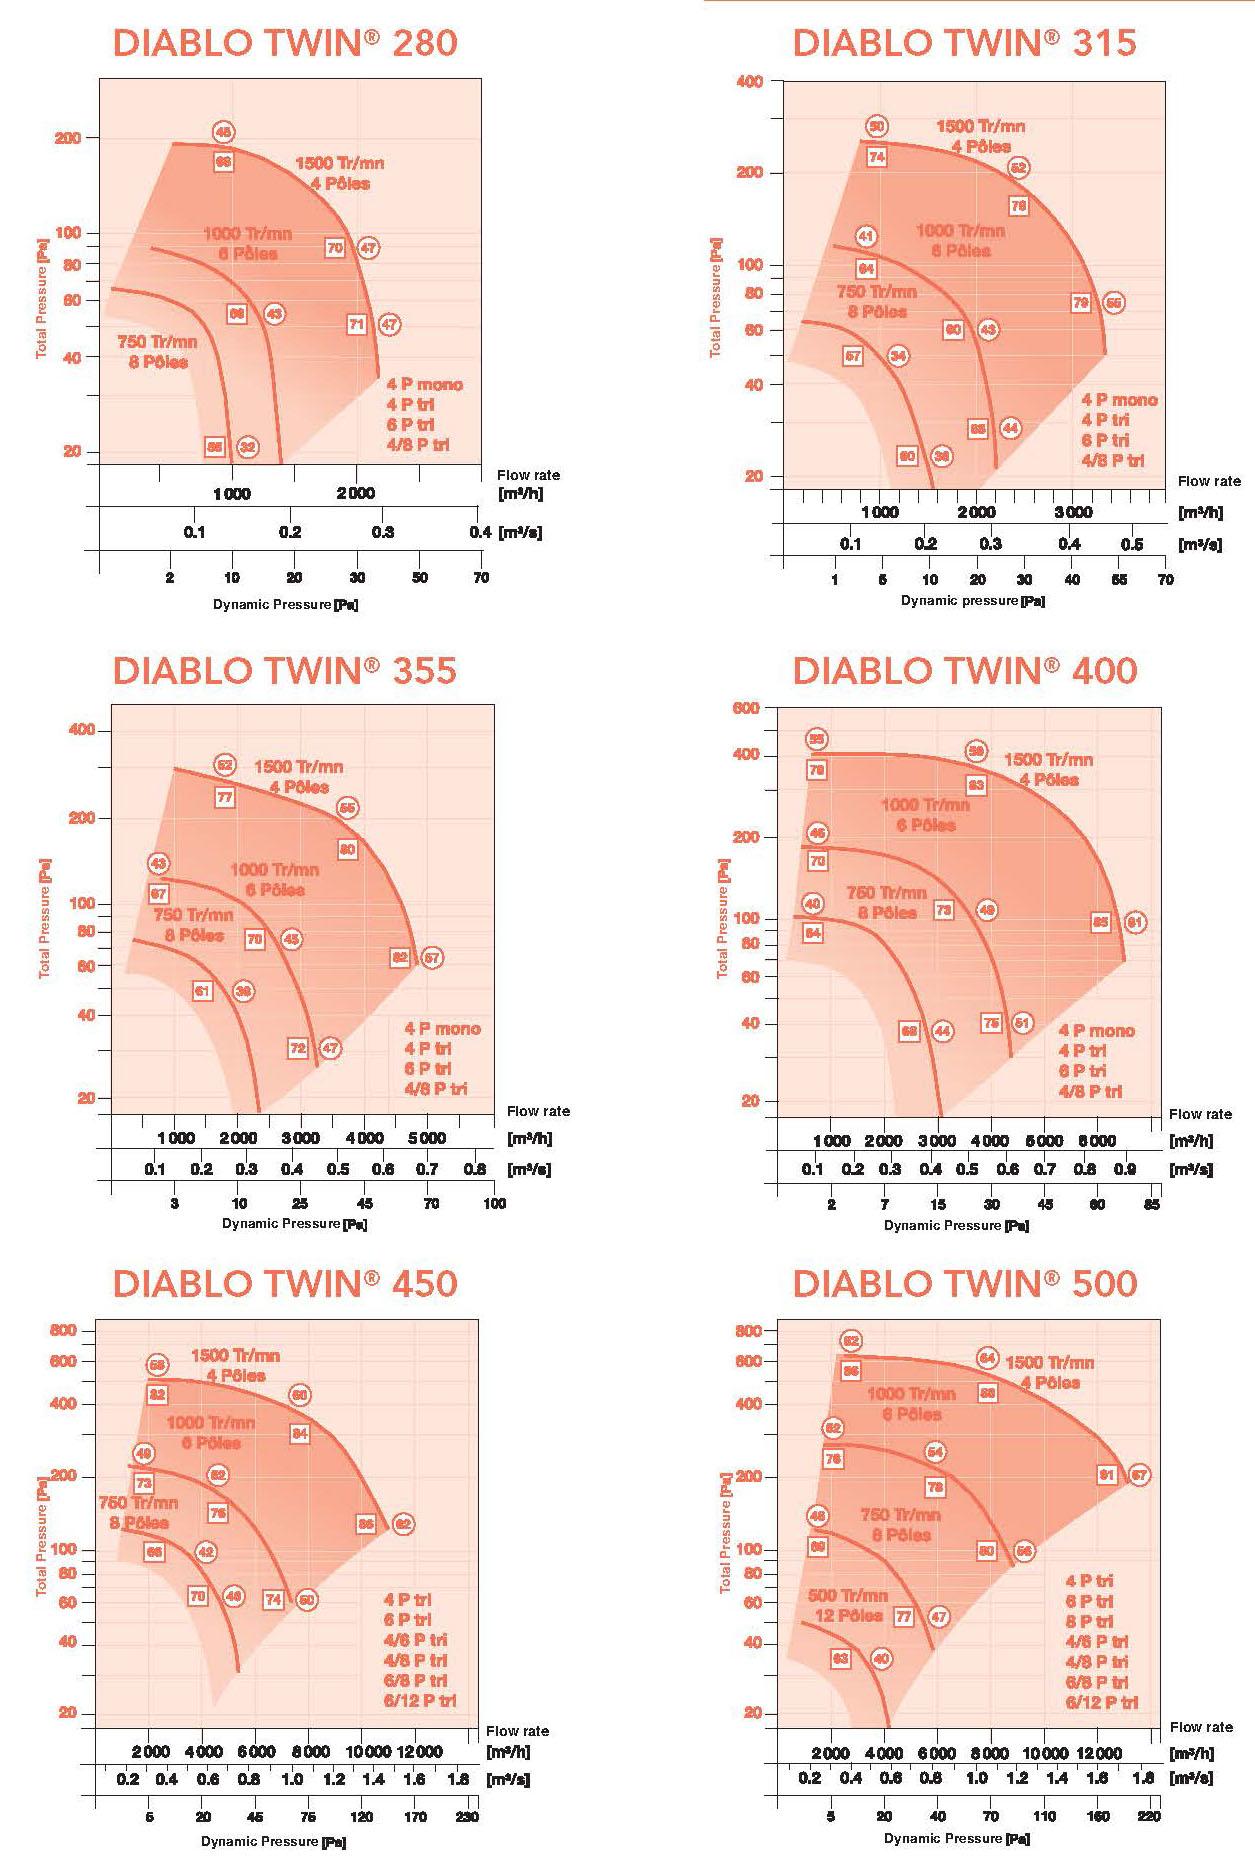 Caladair Diablo Twin Air Flow Rates